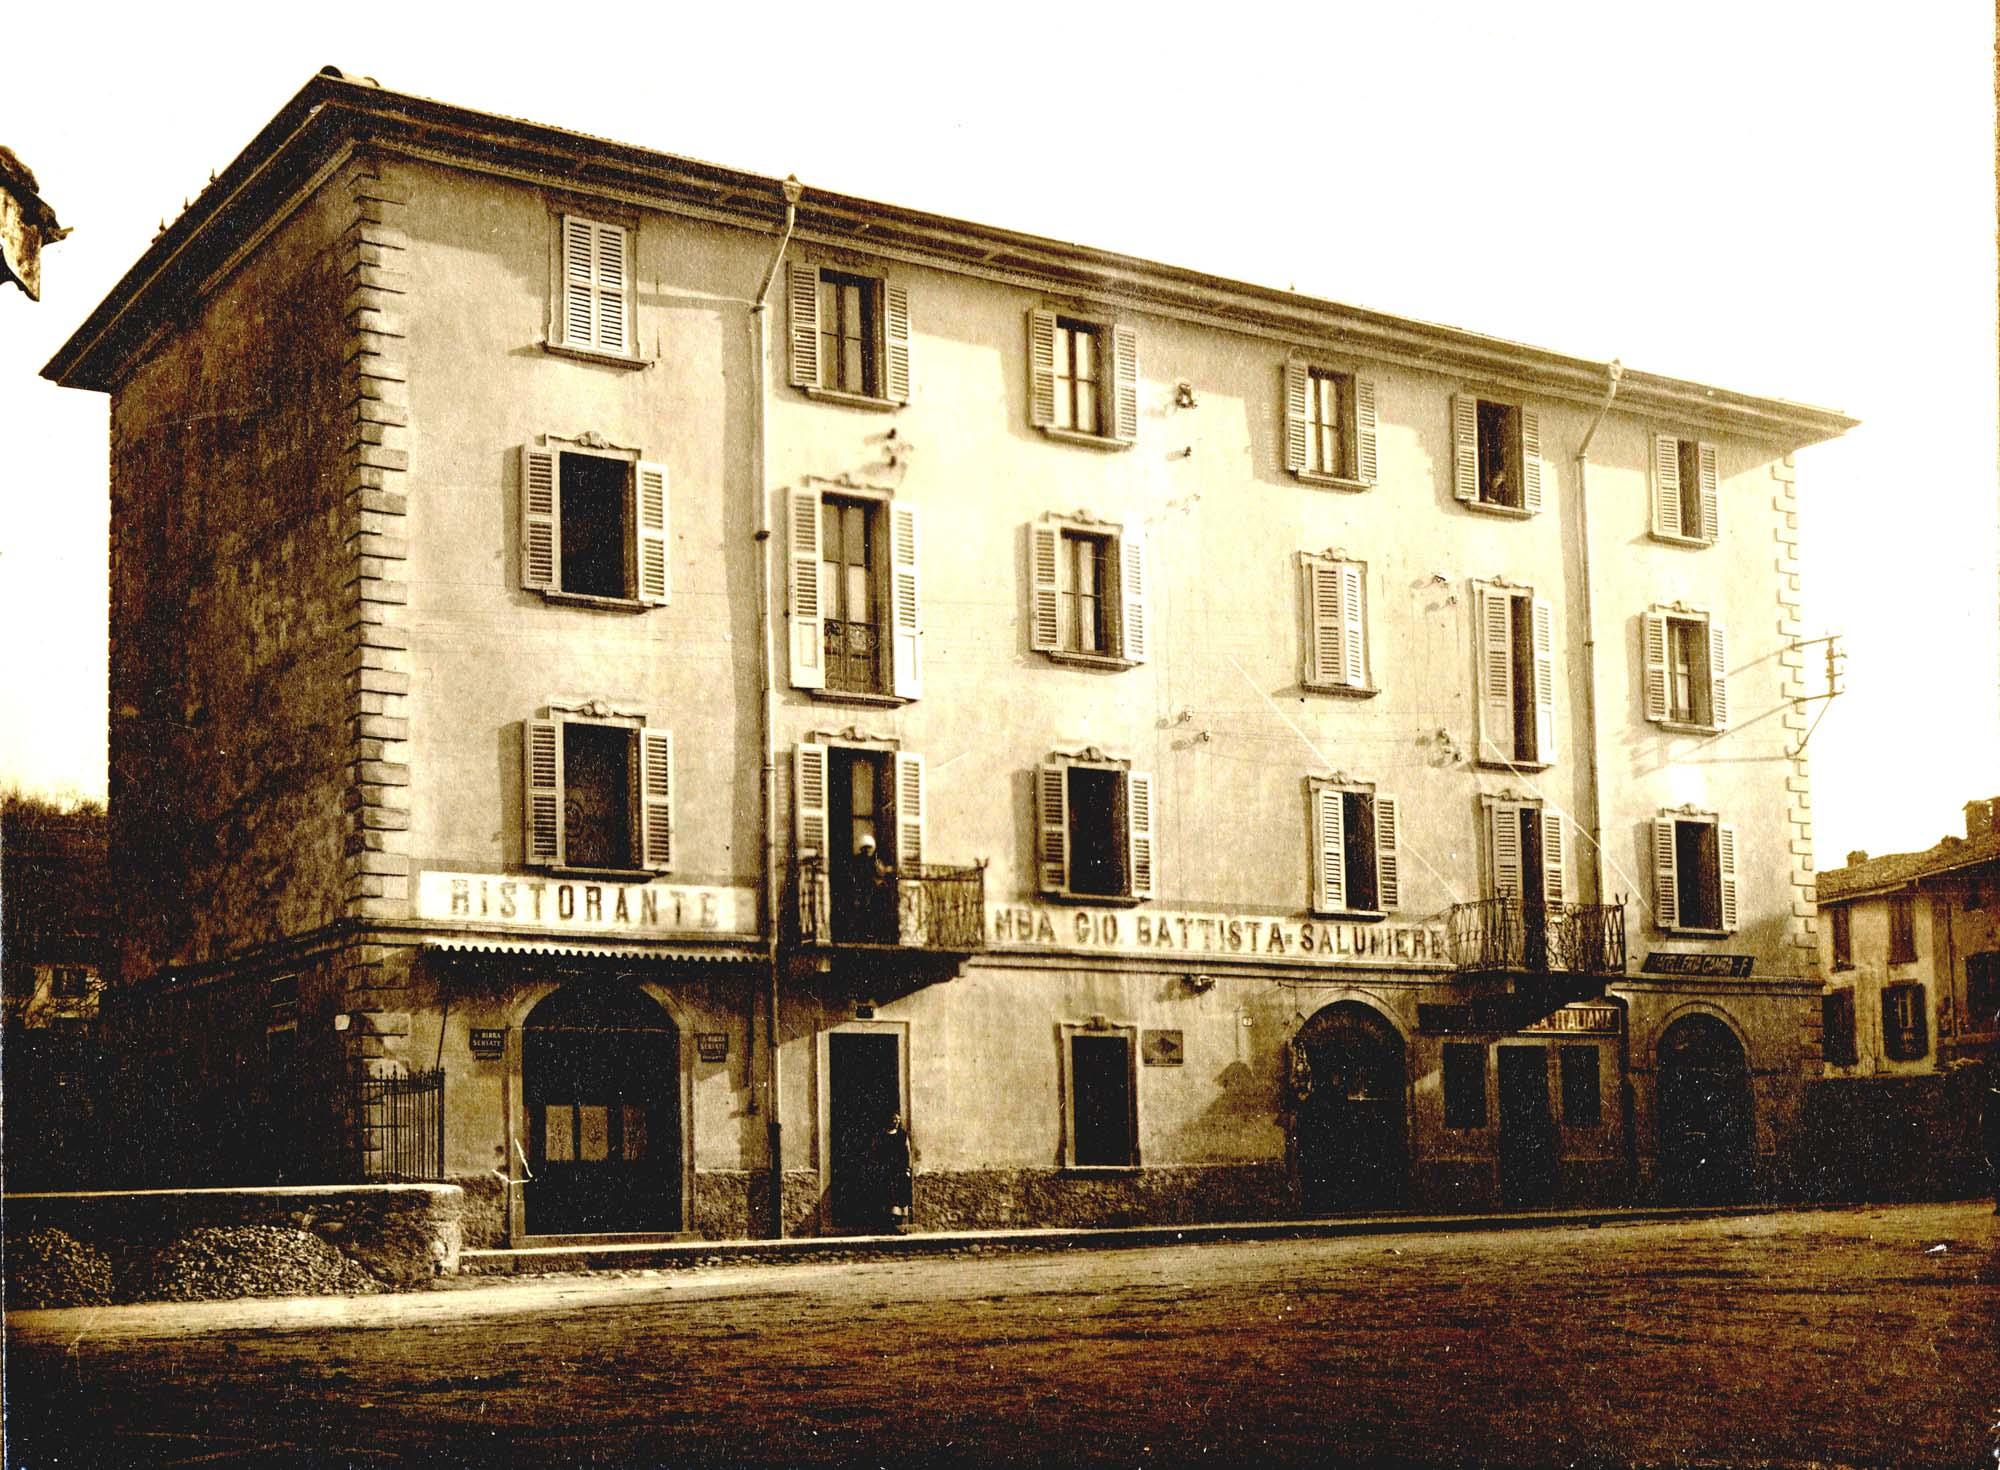 Taverna Gamba Edoardo Bergamo Italiaanse landgoedwinkel Landrucci Utrechtse platteland Werkhoven